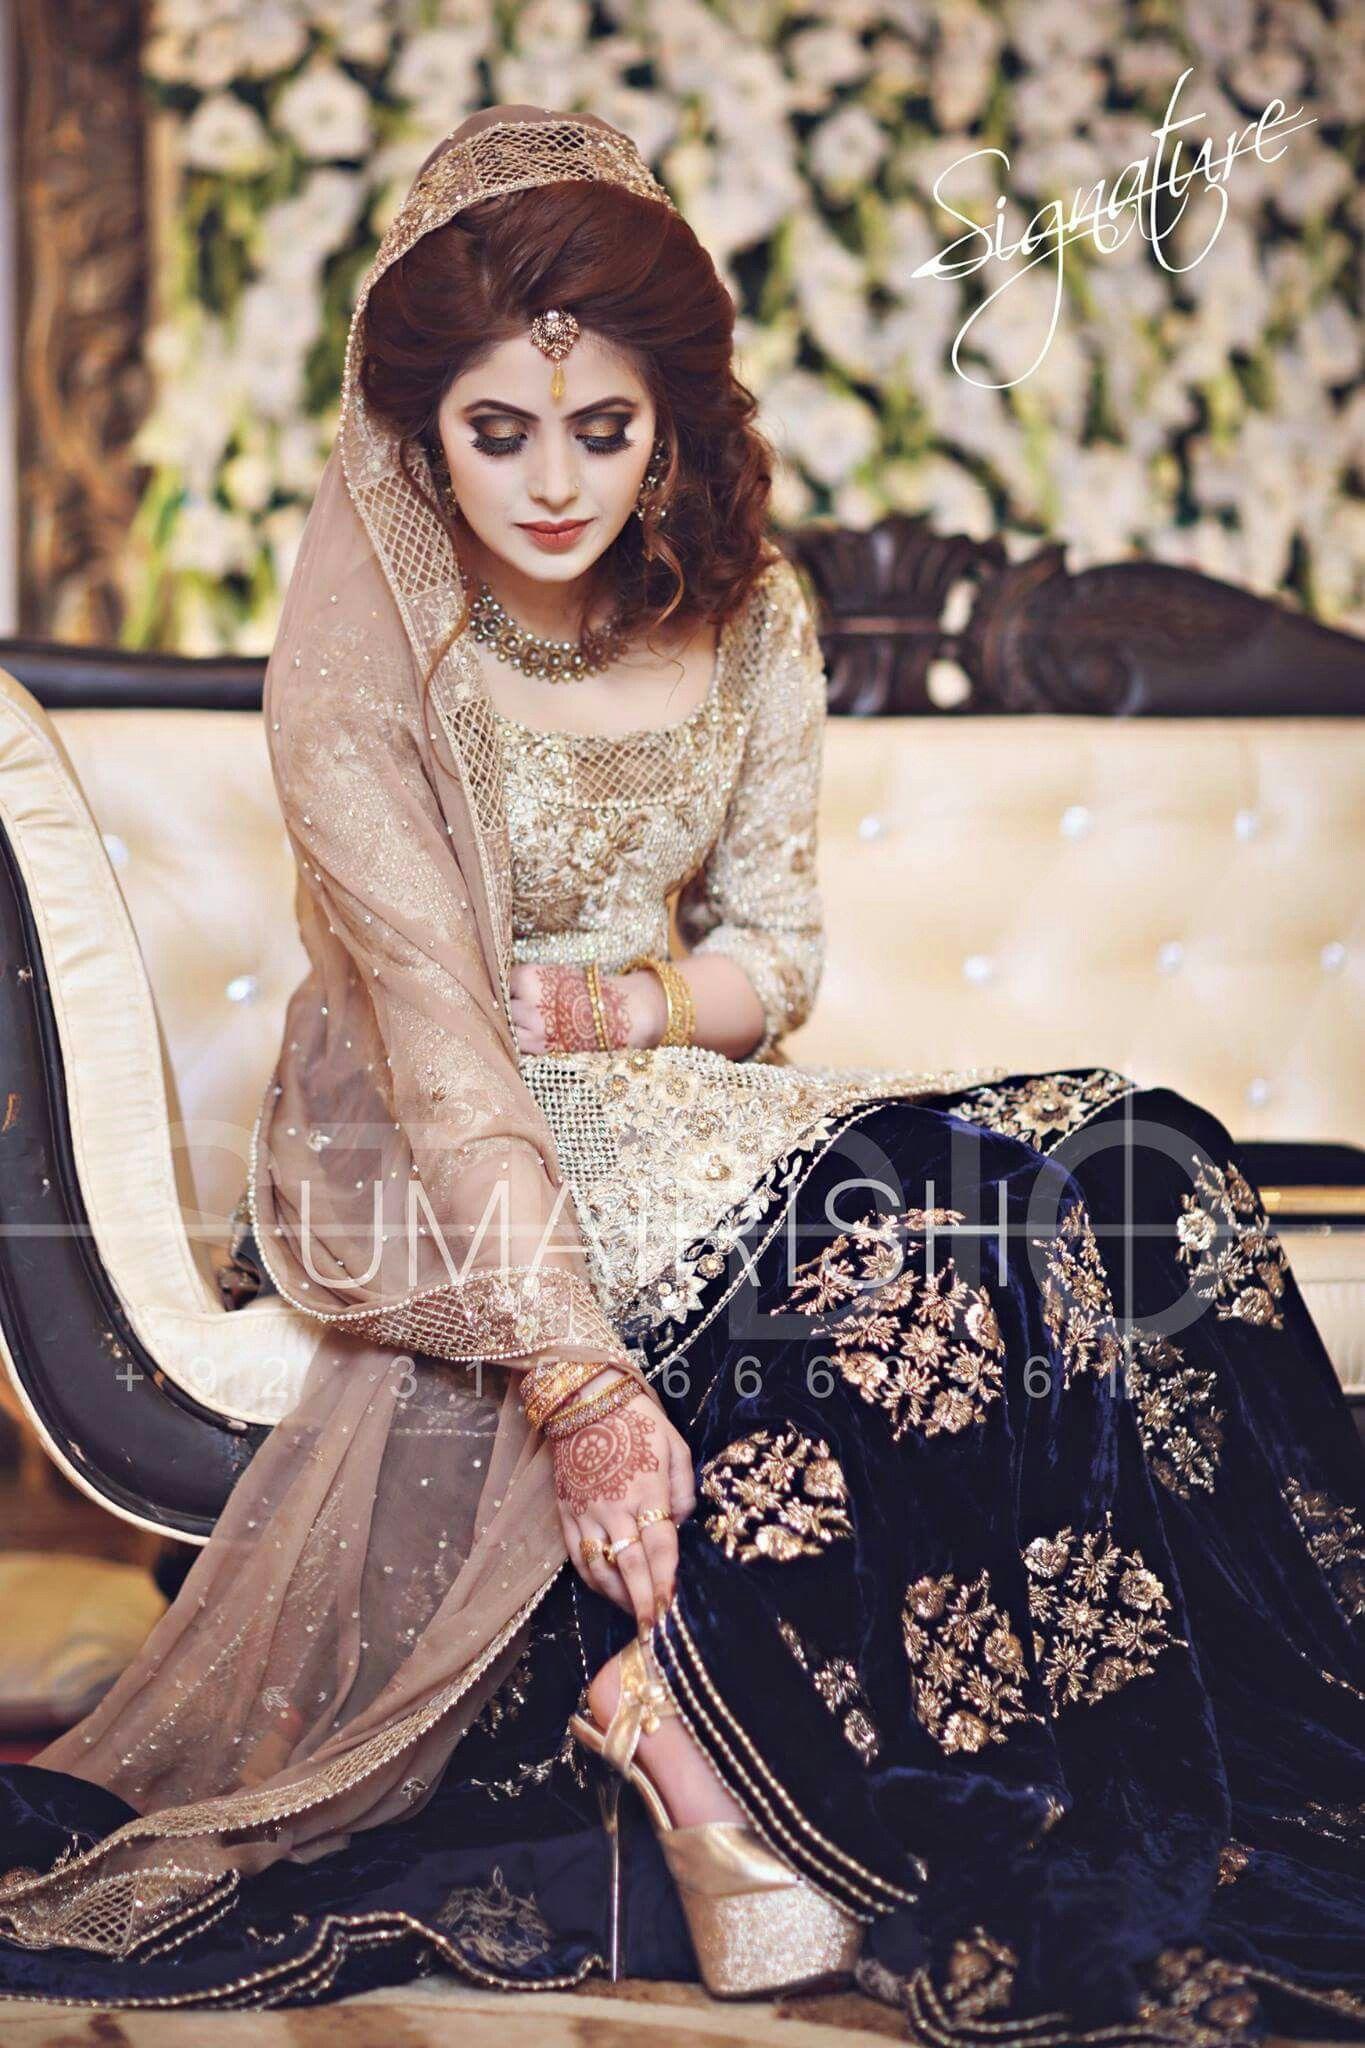 Pin von Sophia K auf Pakistani Wedding | Pinterest